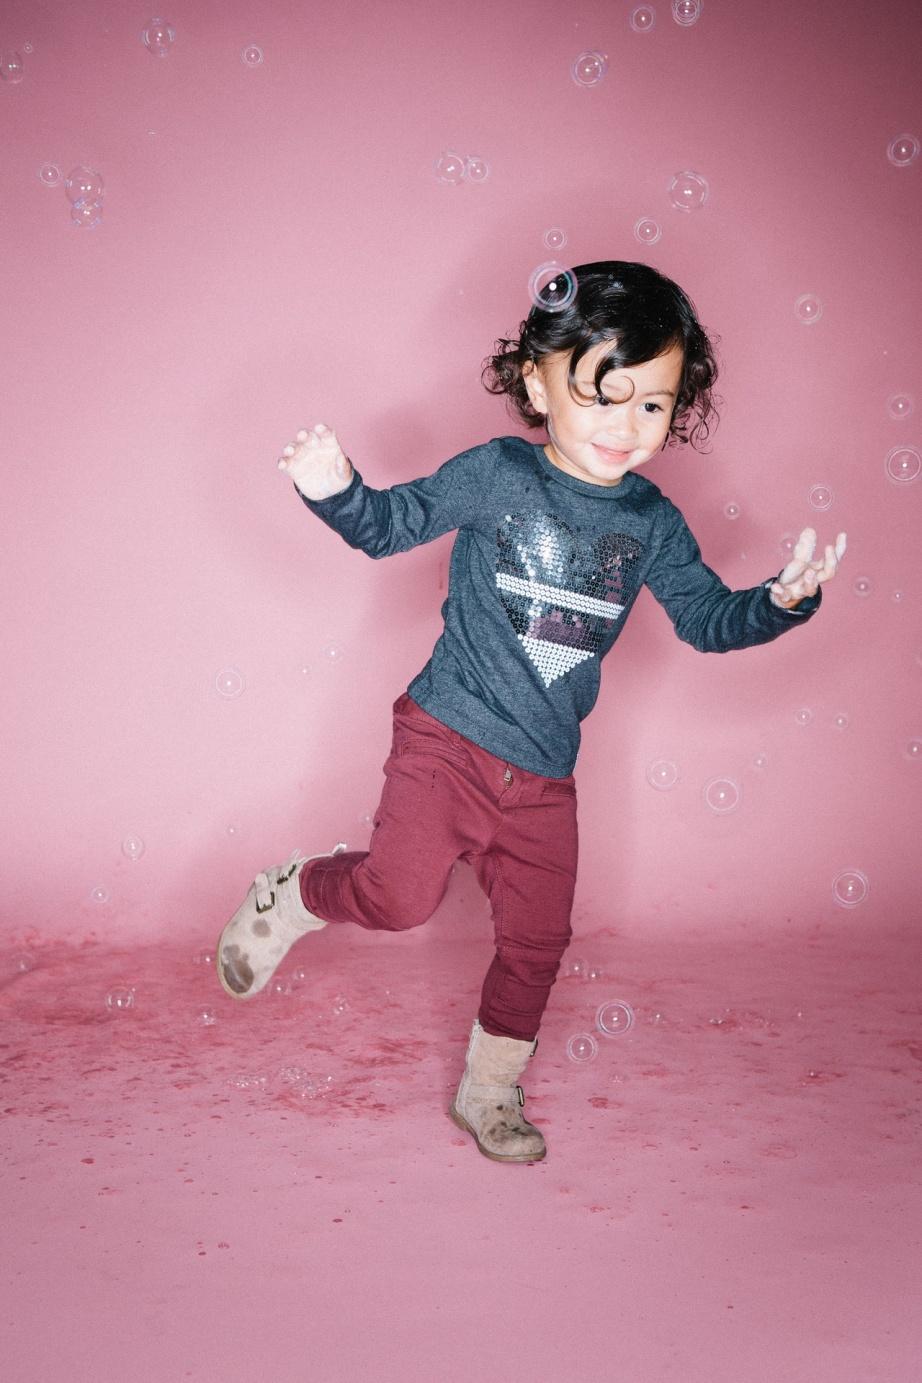 kids in bubbles photography studio nicole caldwell 10